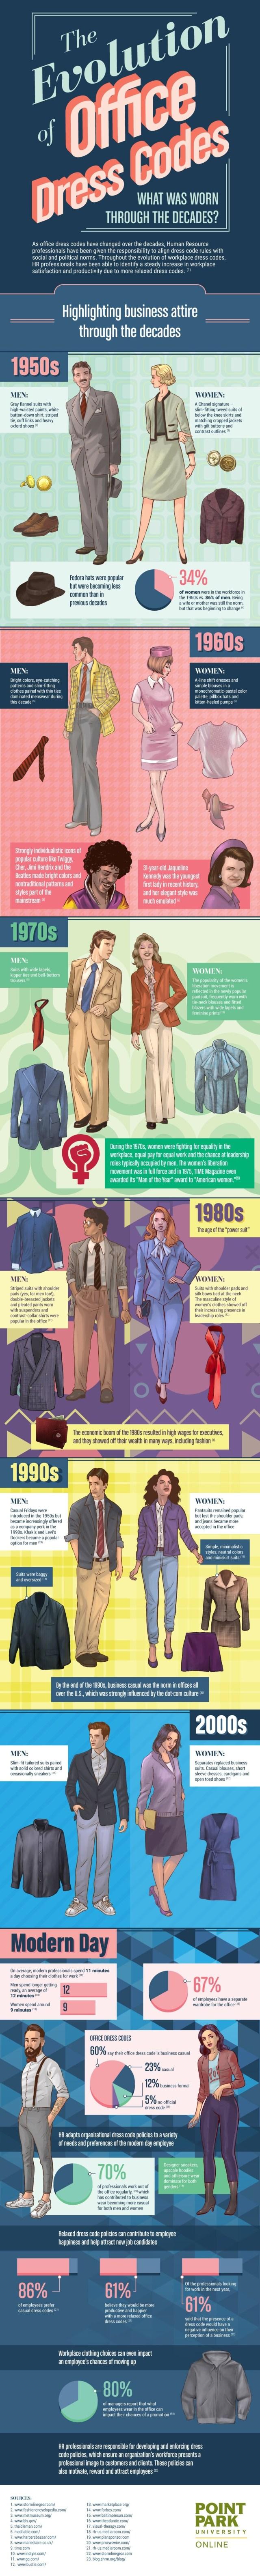 Dress Codes info